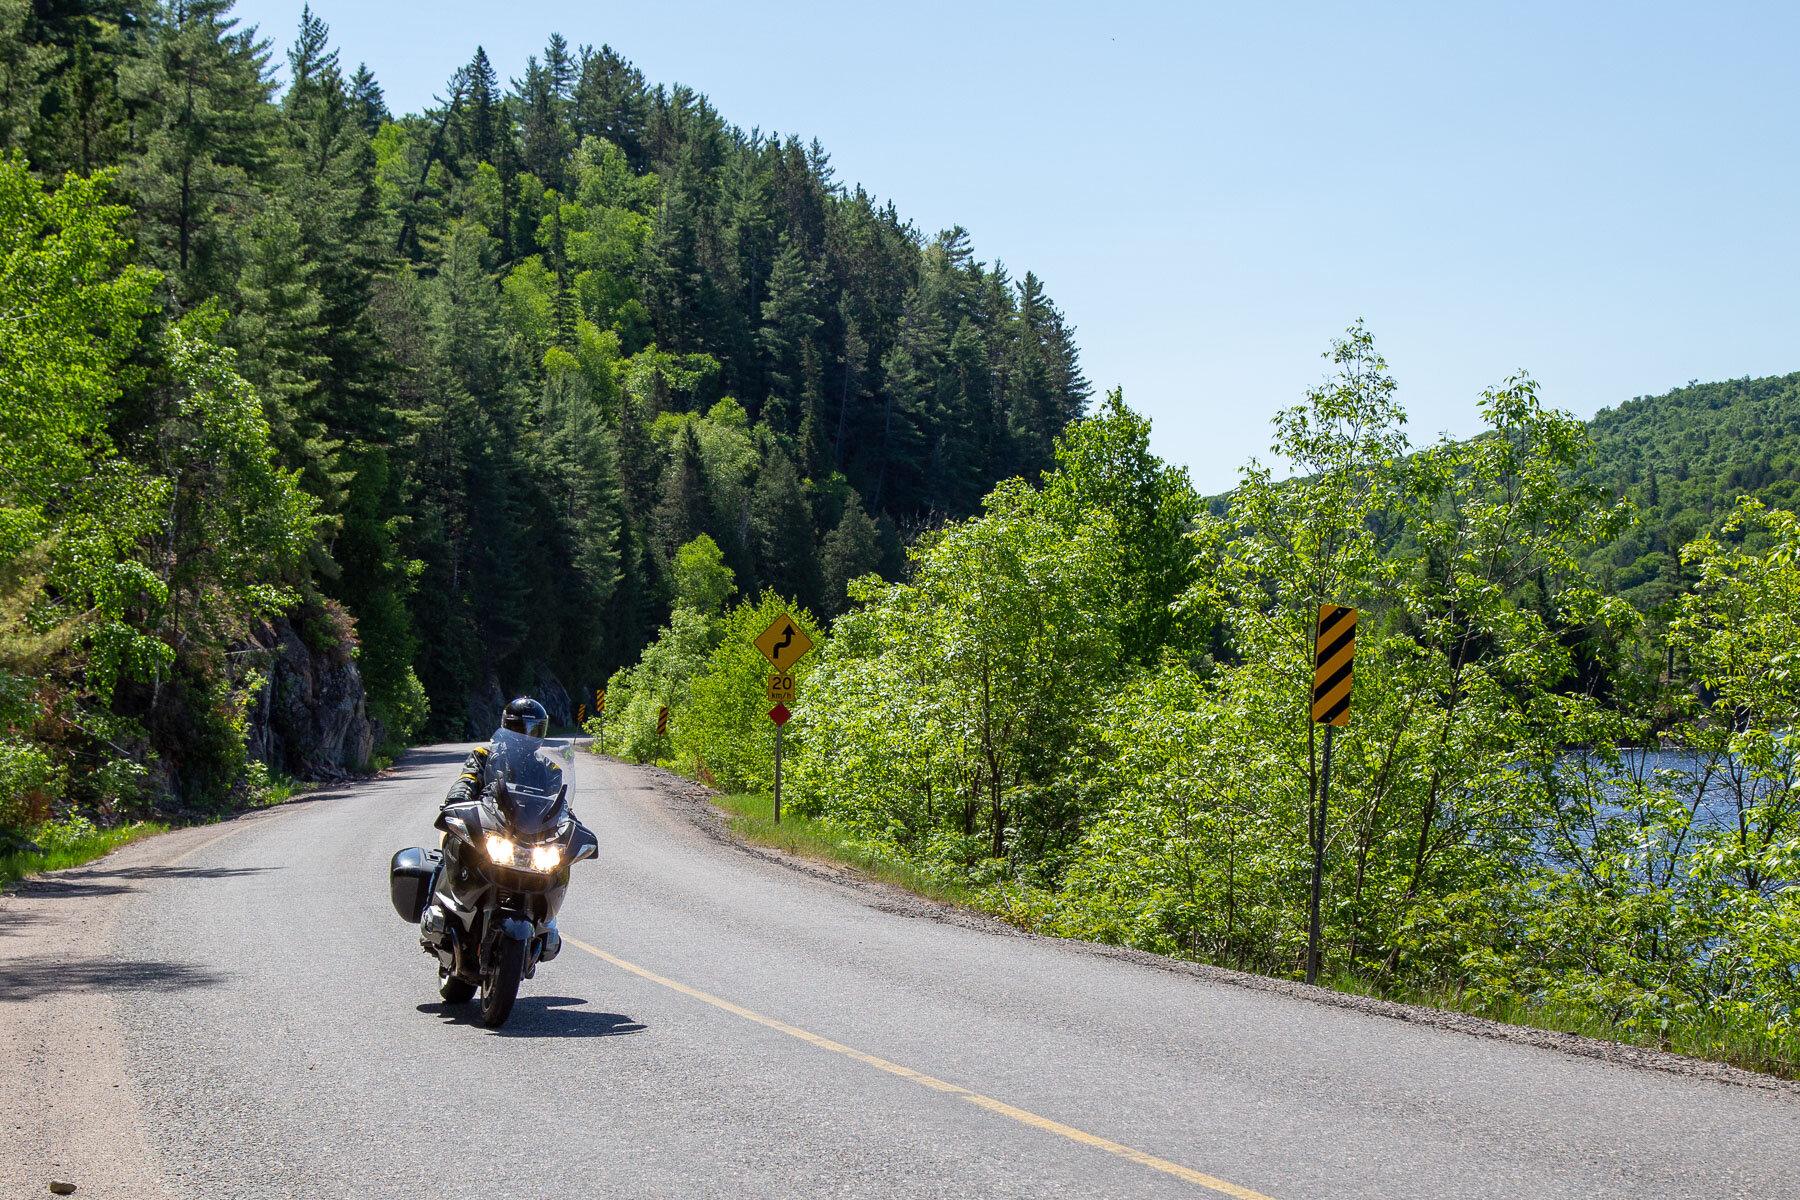 Algoma's Highway 129 - ONTARIO'S BEST ROADS